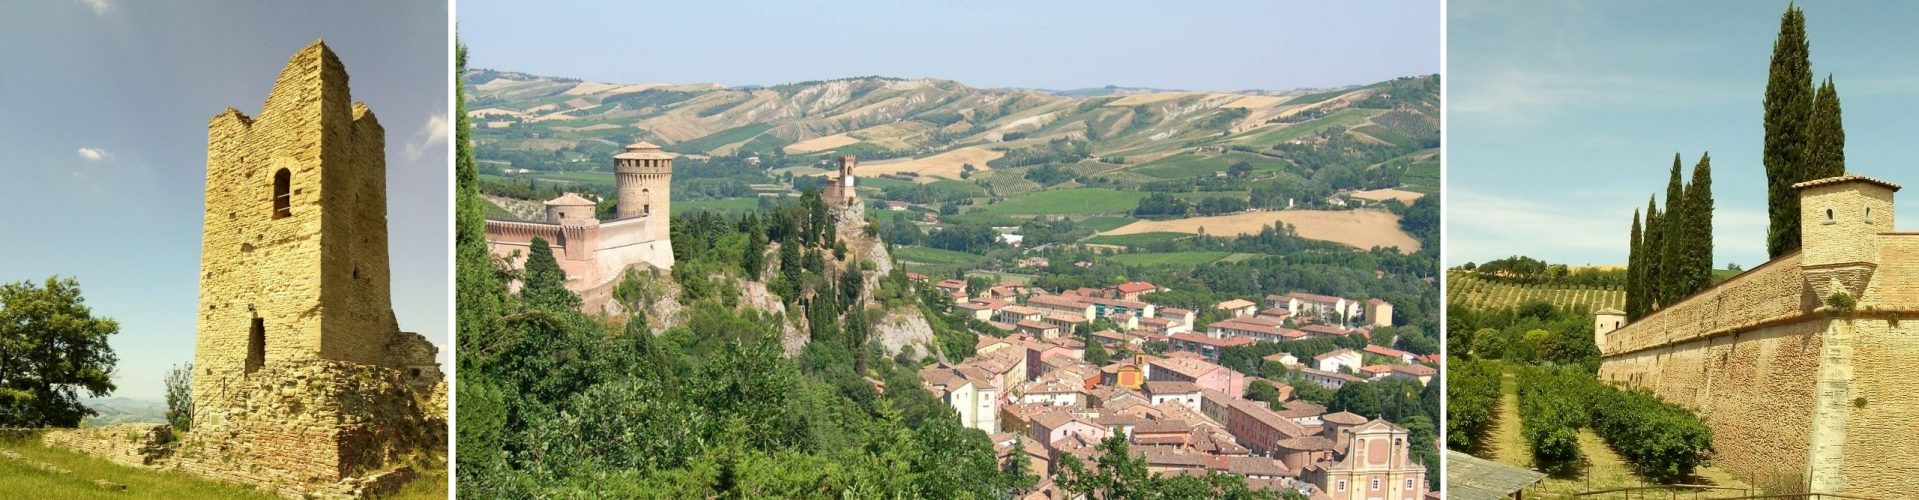 discover-romagna-ravenna-dozza-cycling-culinary-tour/5